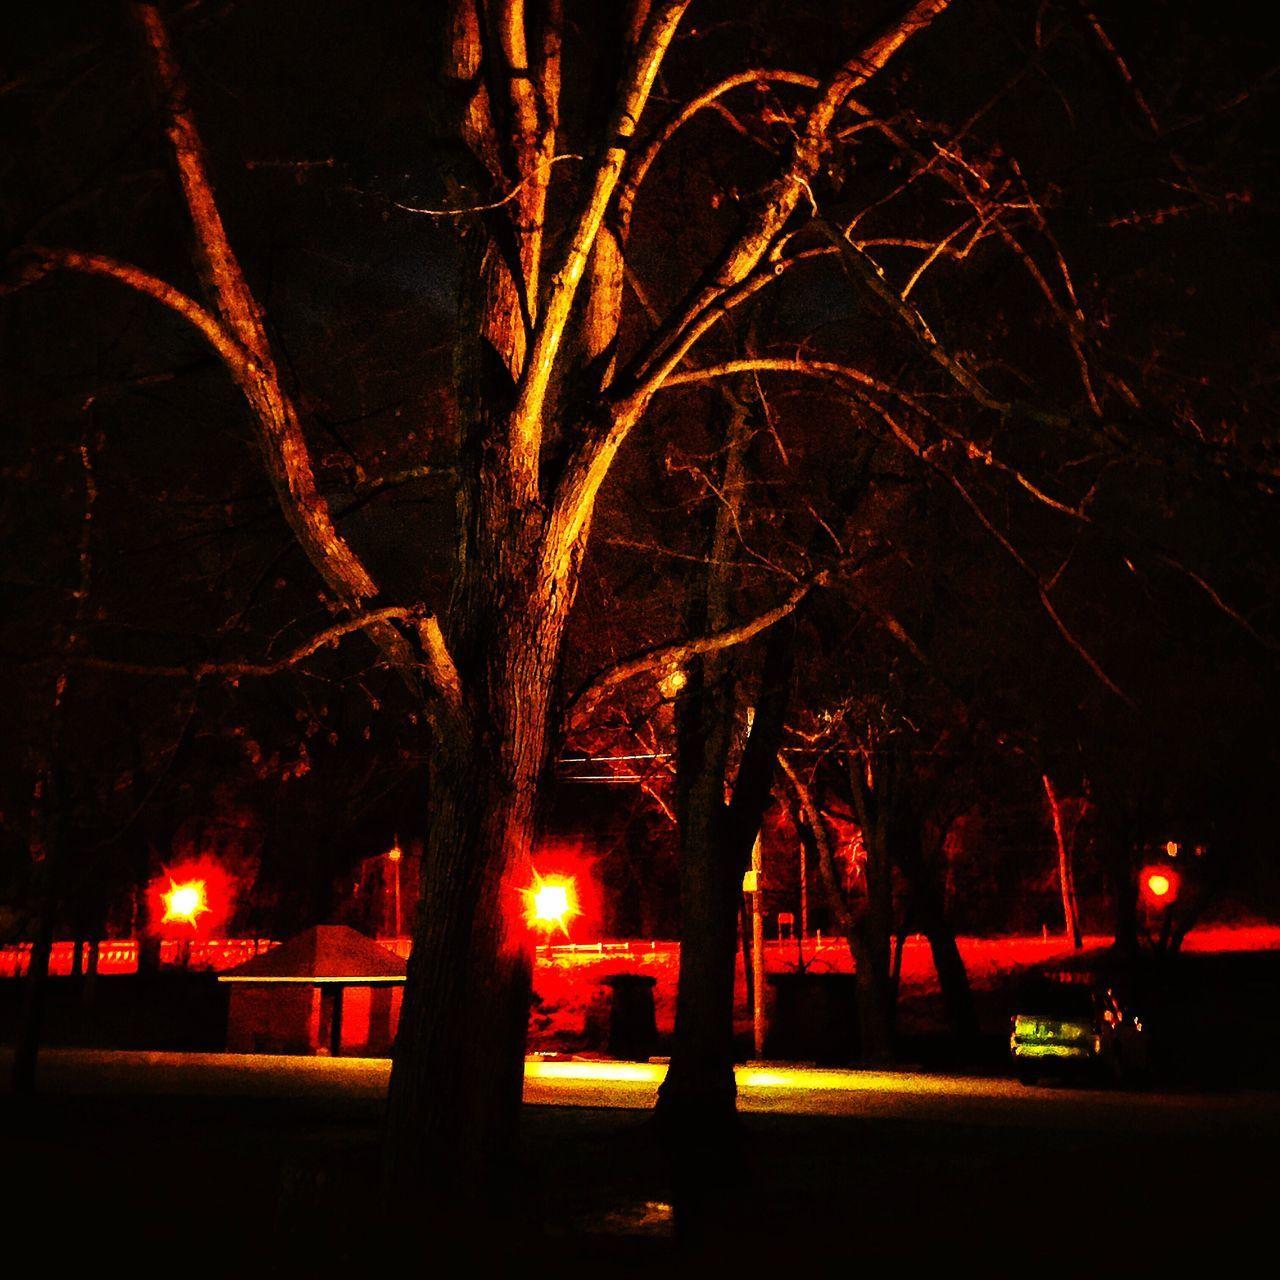 night, illuminated, tree, outdoors, car, no people, bare tree, nature, branch, city, sky, scenery